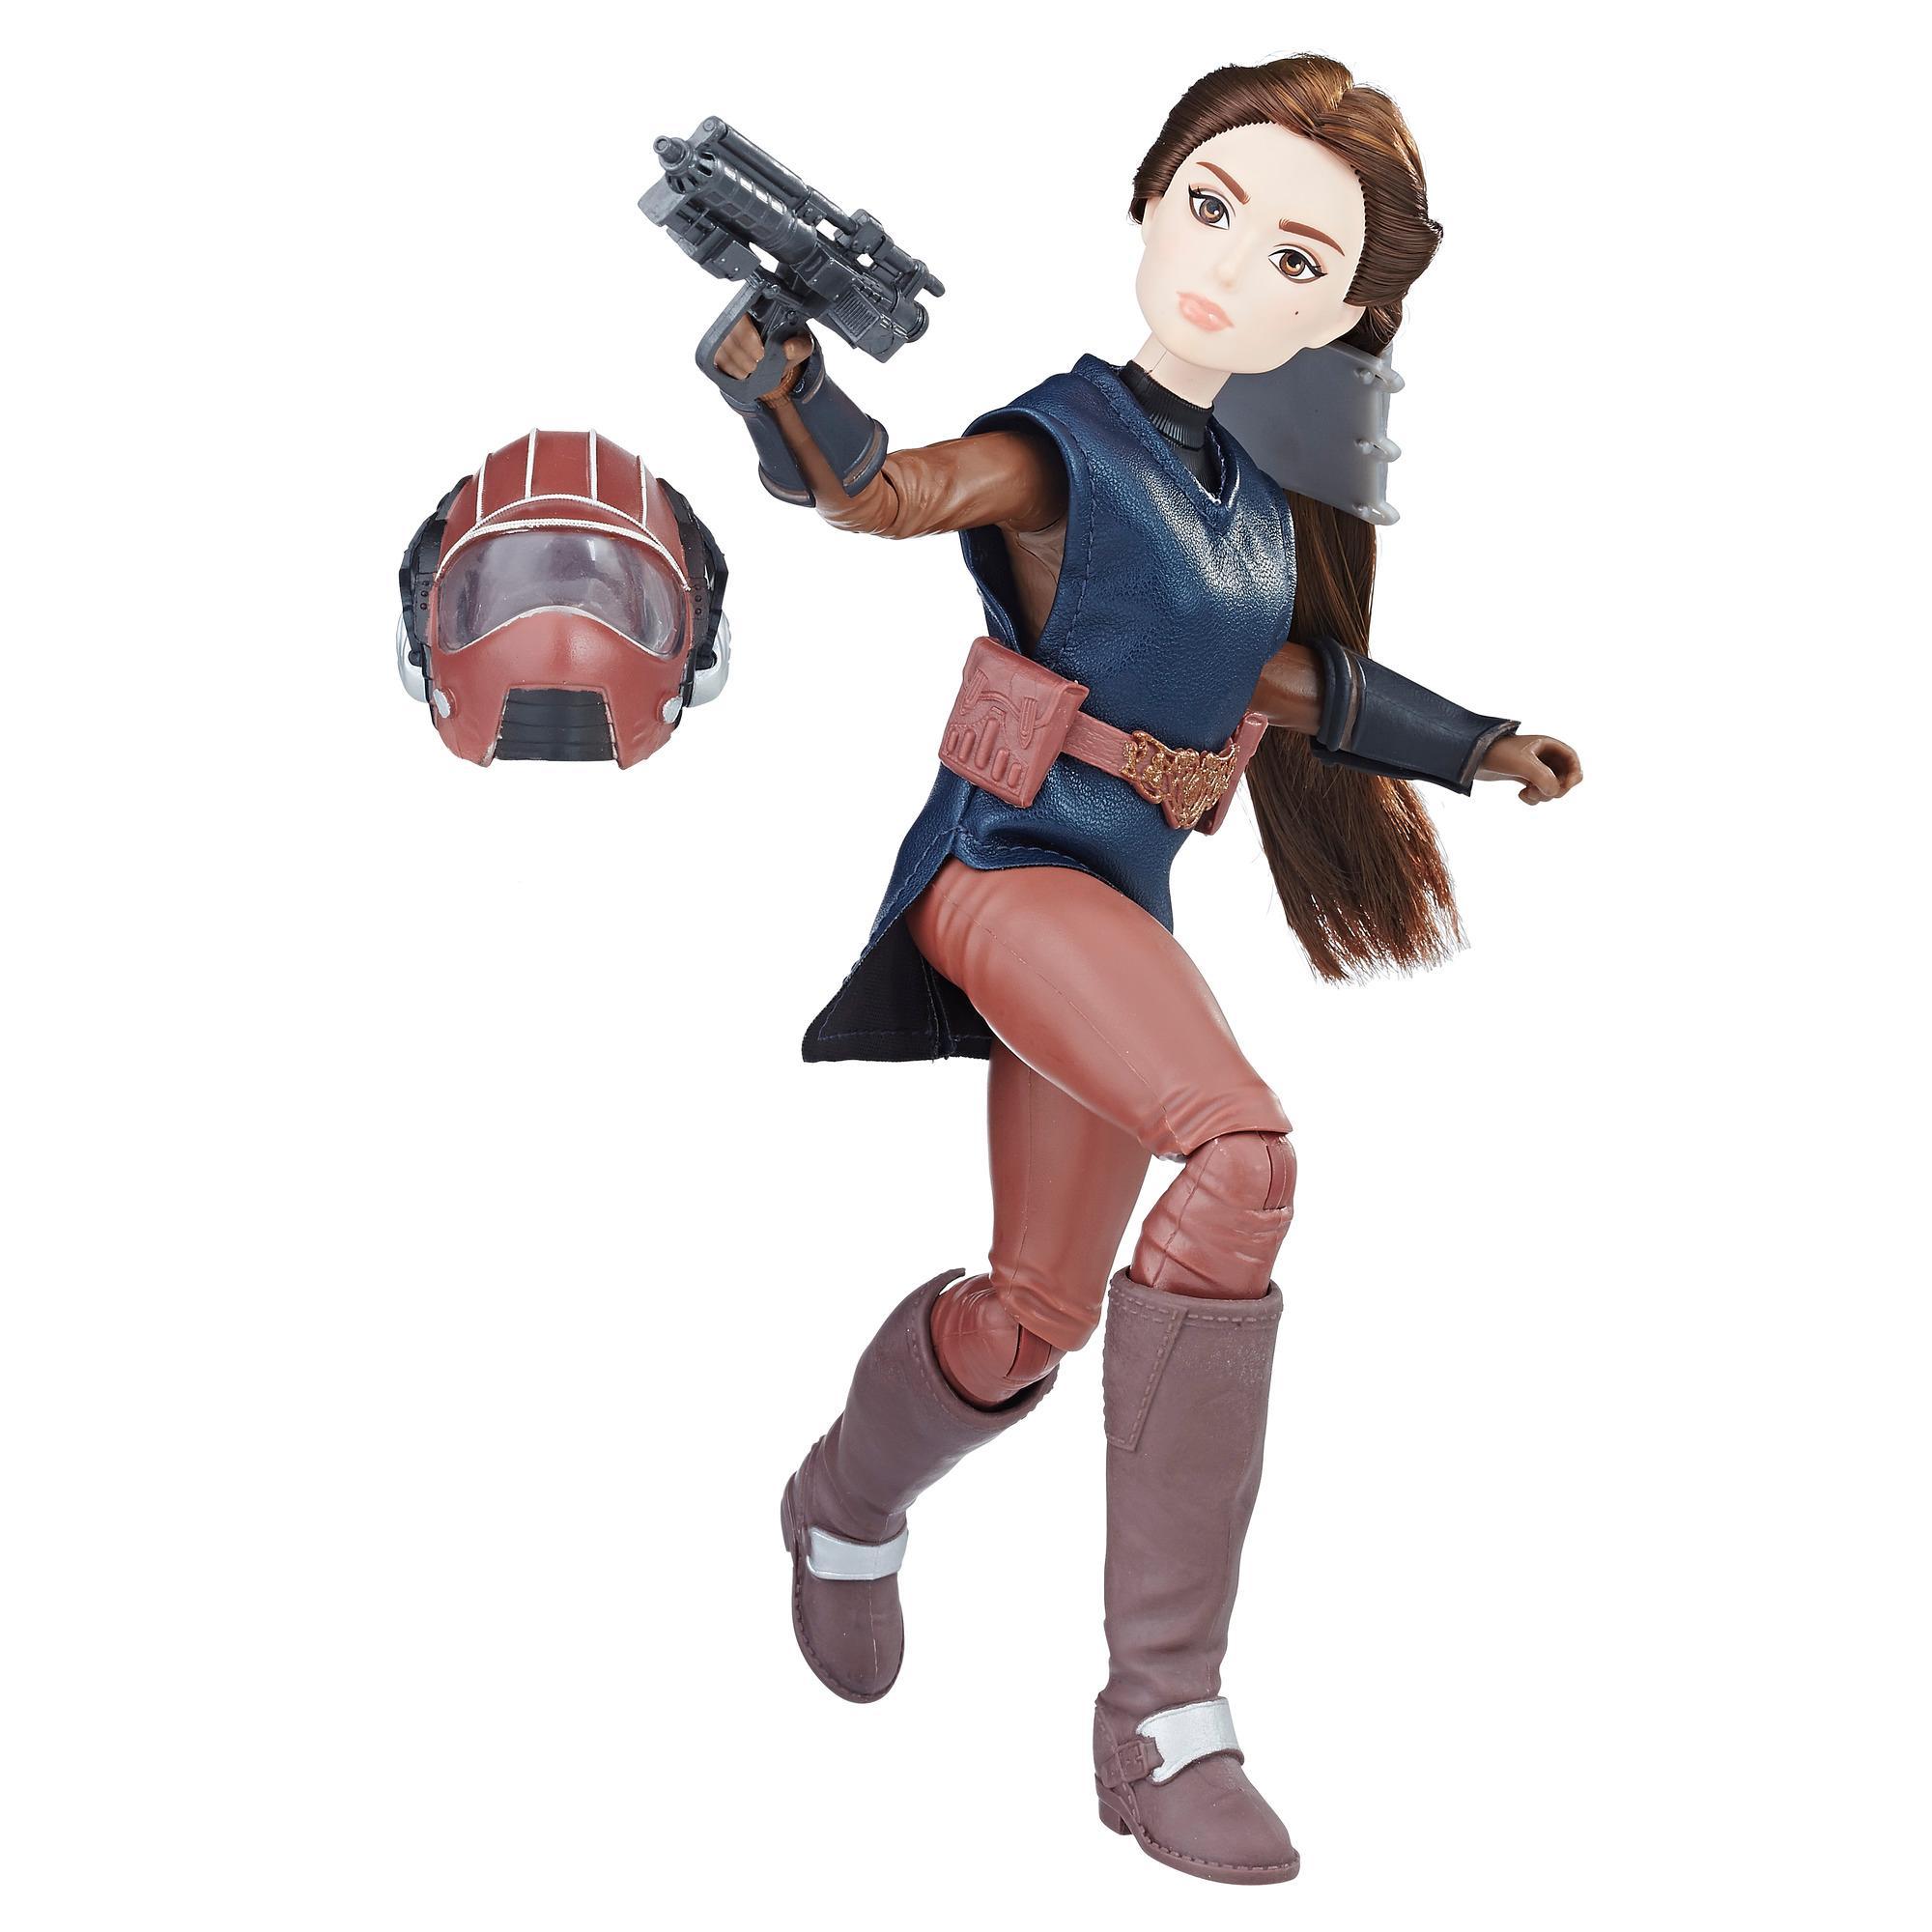 Star Wars Forces of Destiny Padme Amidala Adventure Figure